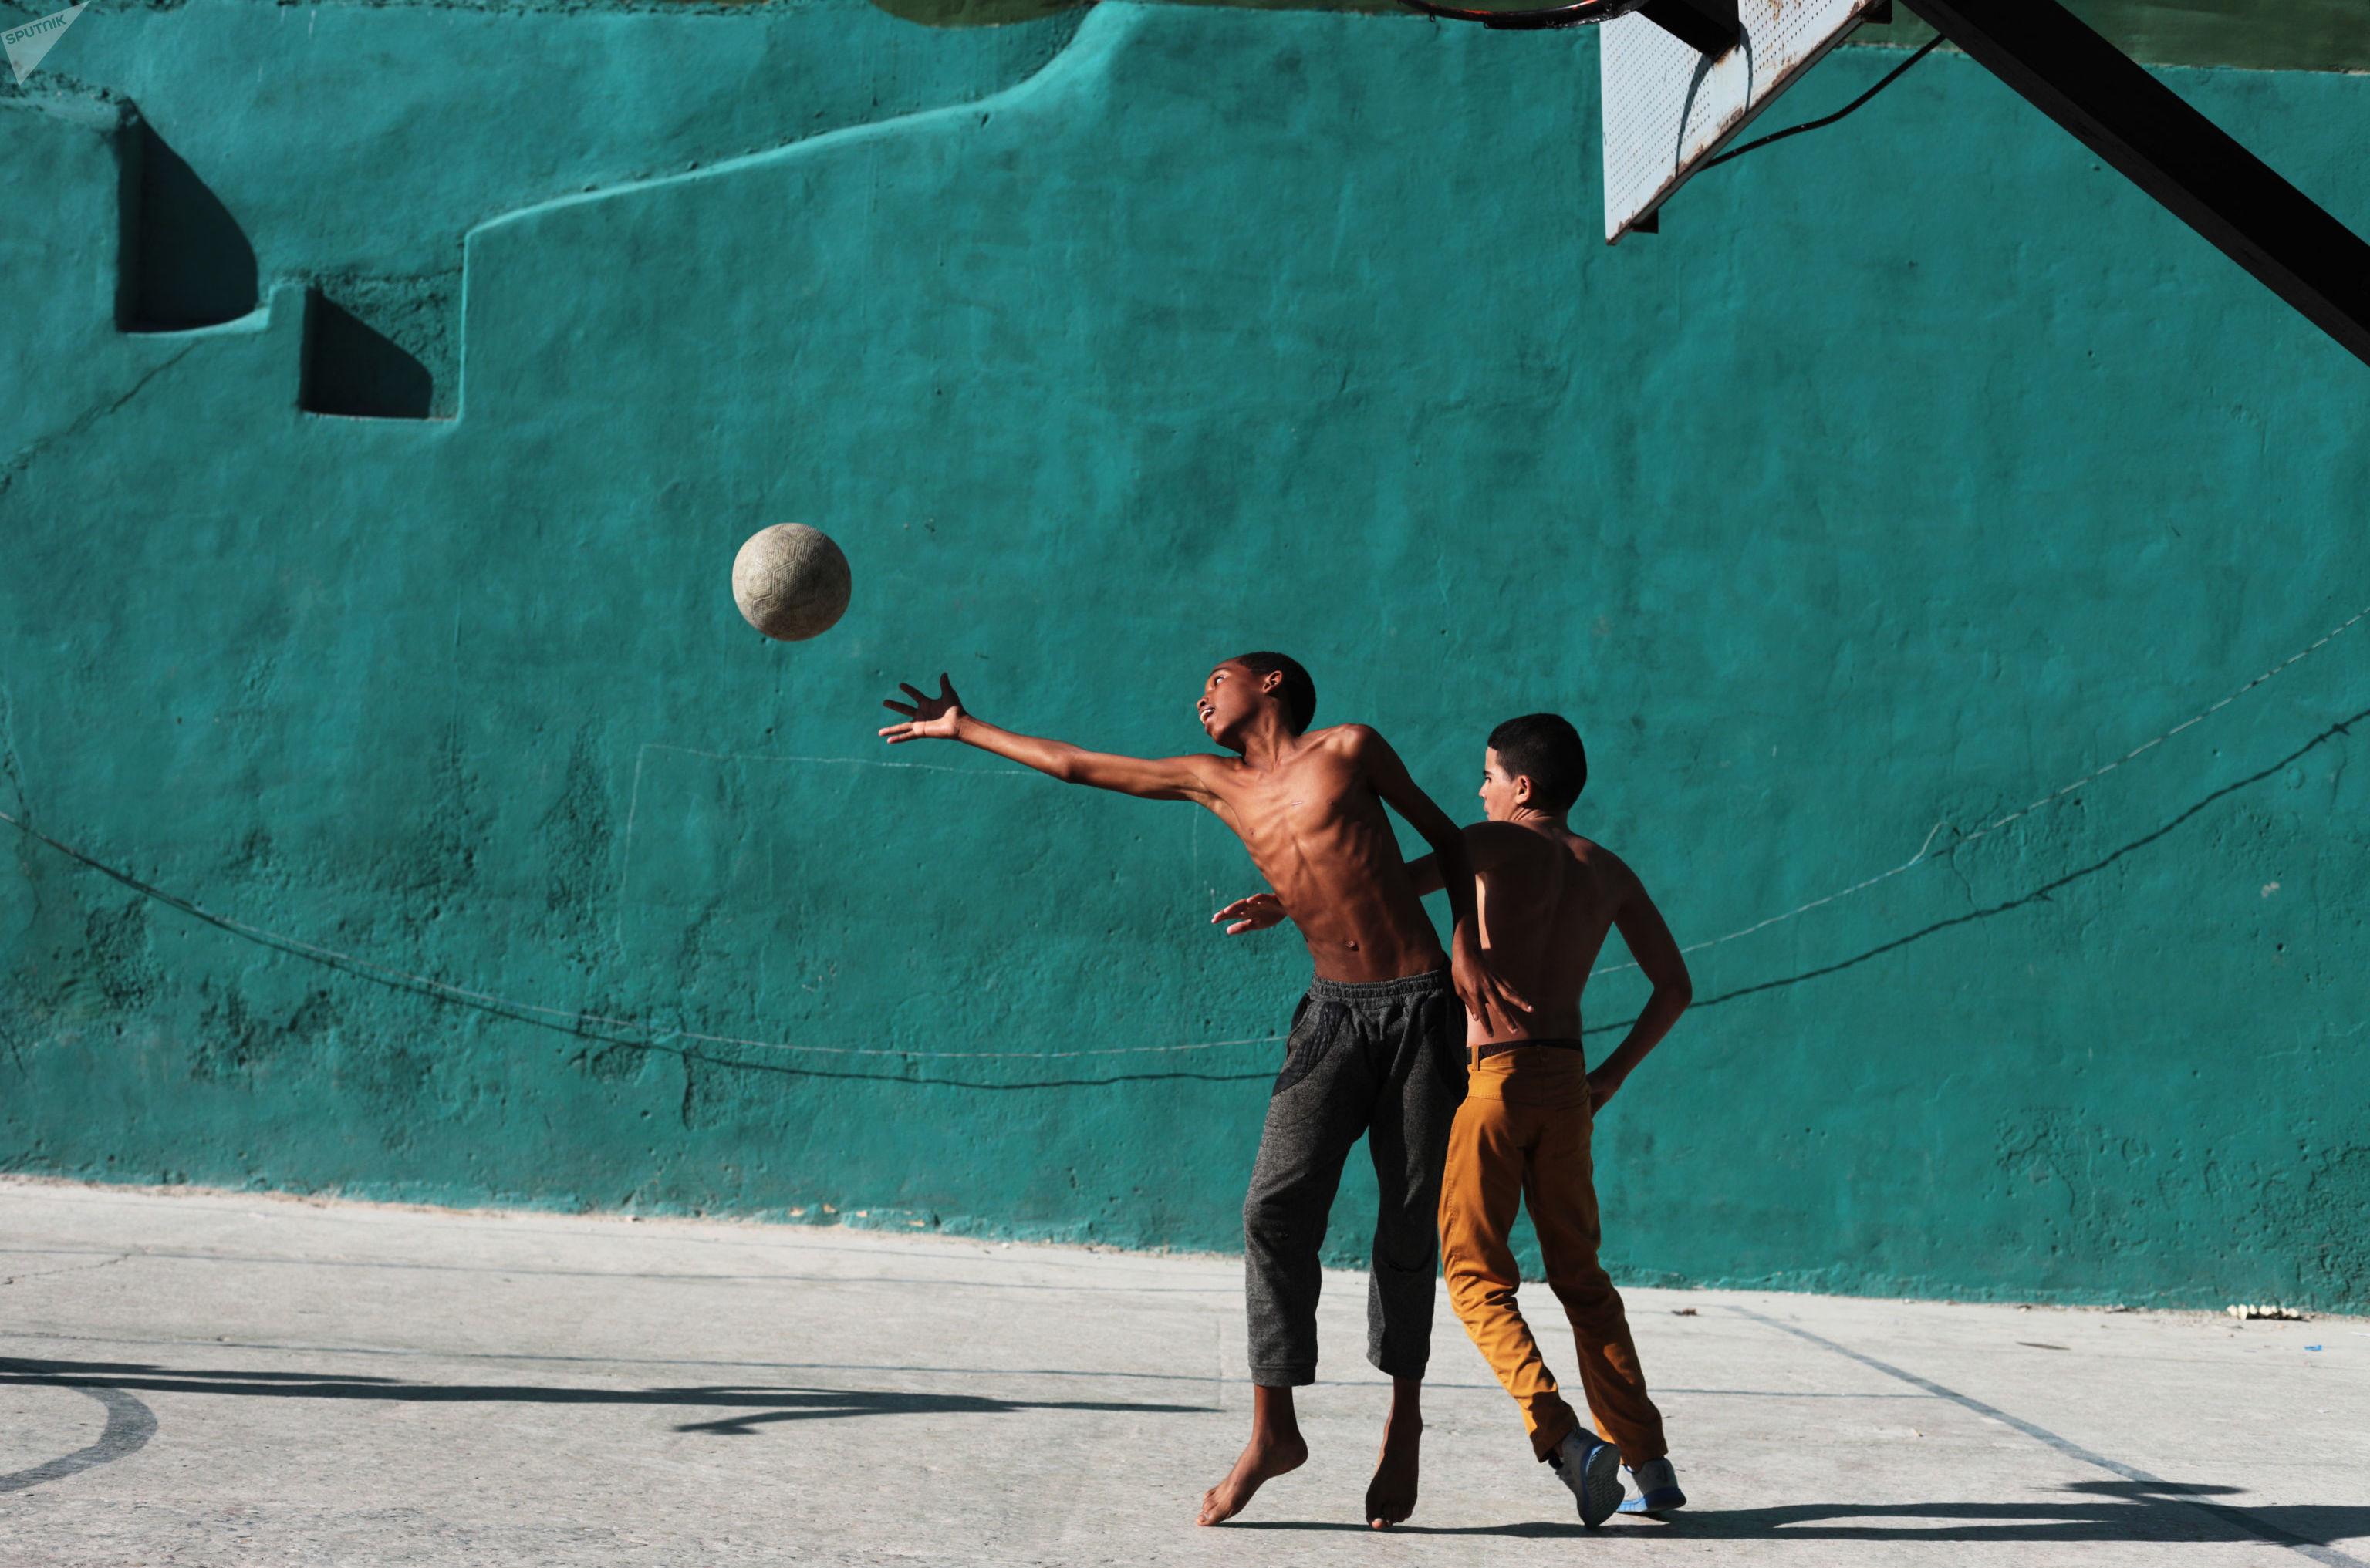 Jovens jogam futebol em Havana Velha, Cuba